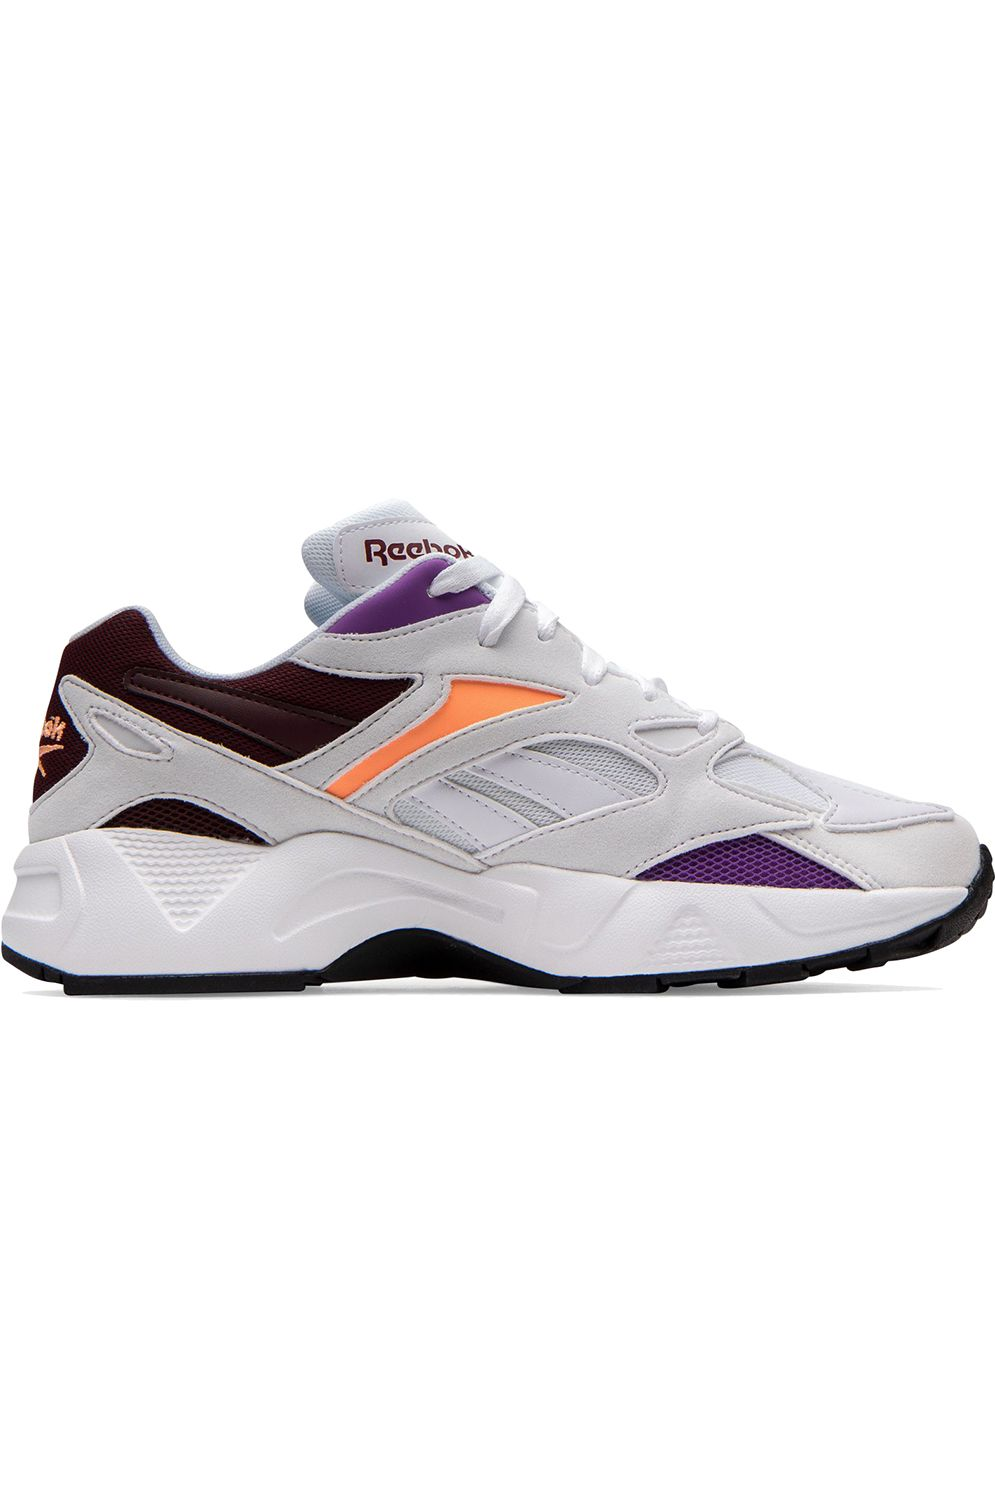 Reebok Shoes AZTREK 96 White/Porcelain/Maroon